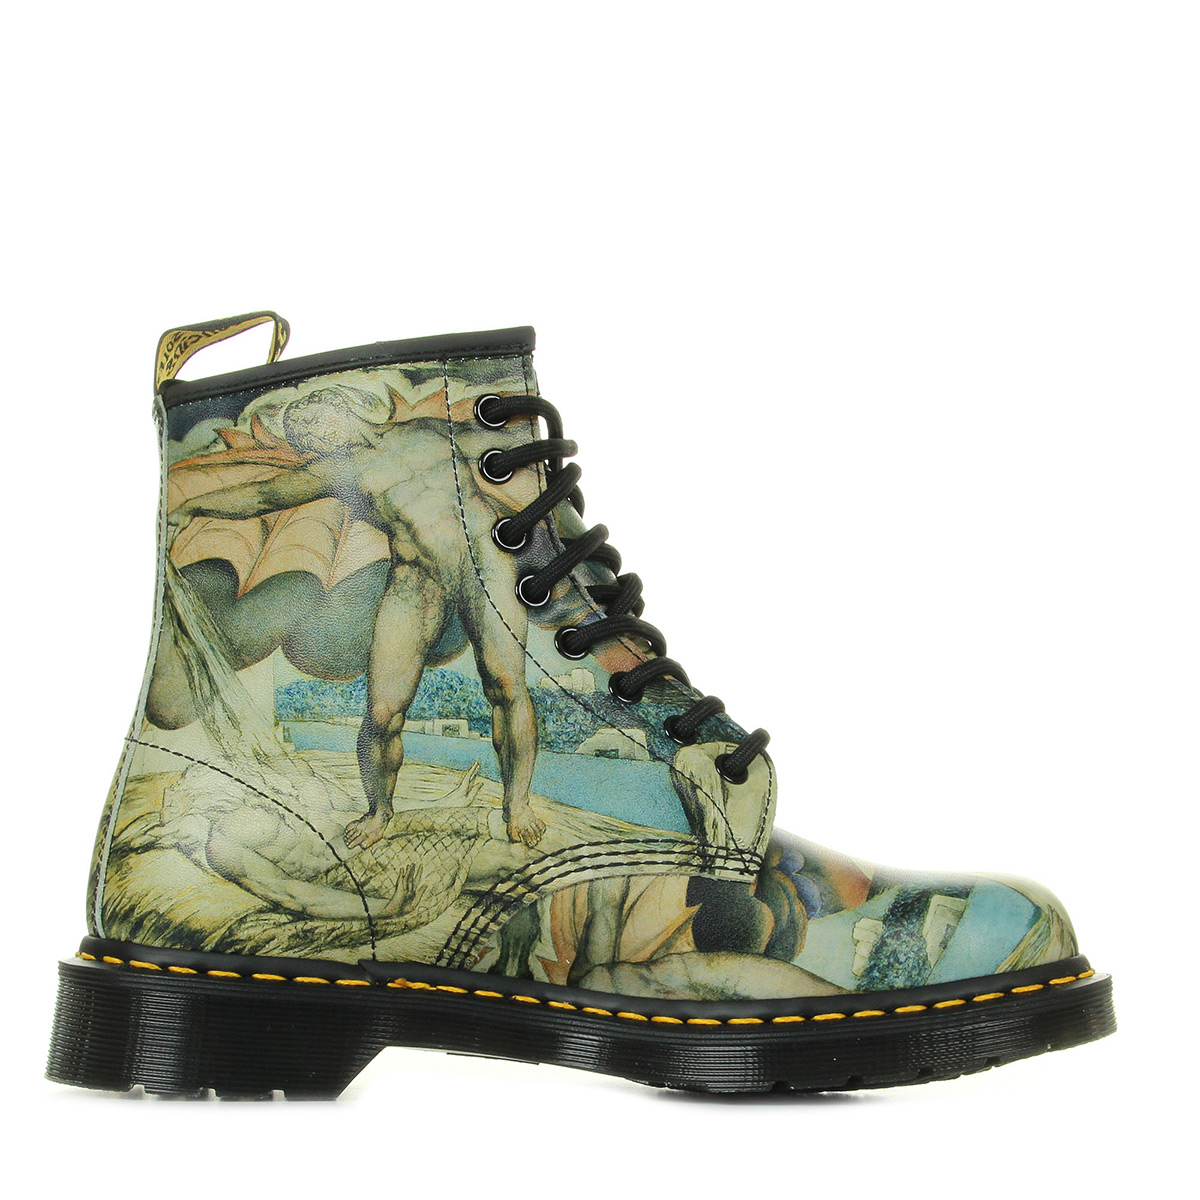 Dr. Martens 1460 Multi William Blake 22873102, Boots